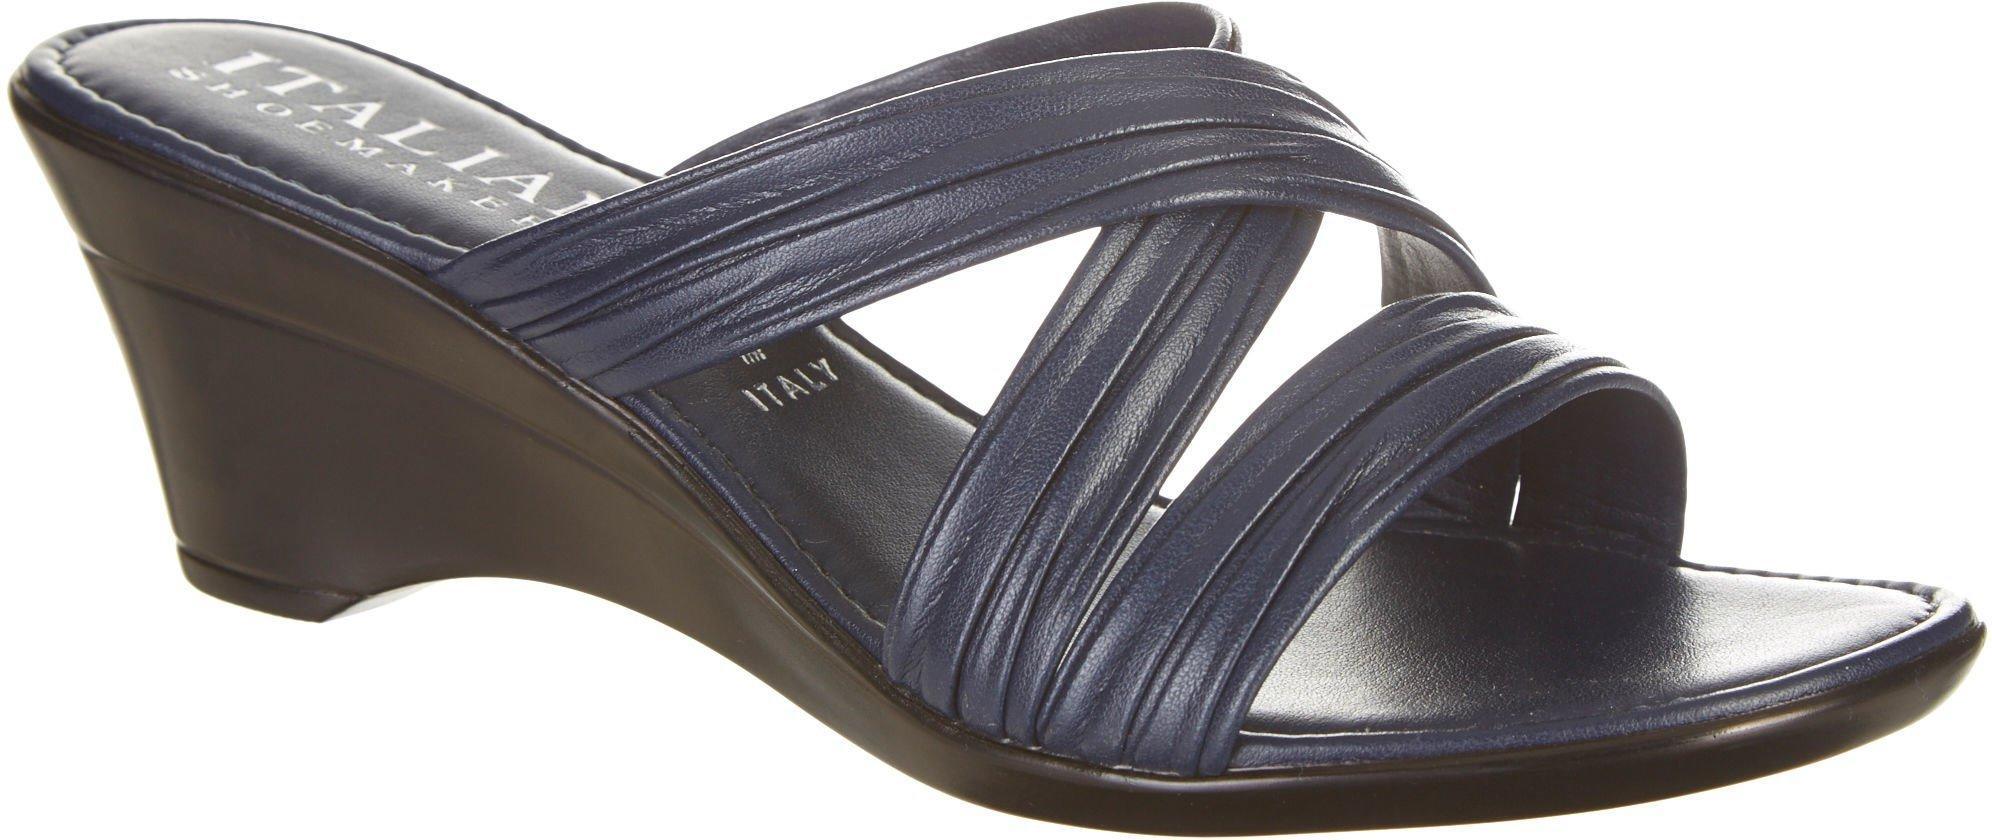 Italian Shoemakers Womens Cruise Wedge Sandals Bealls